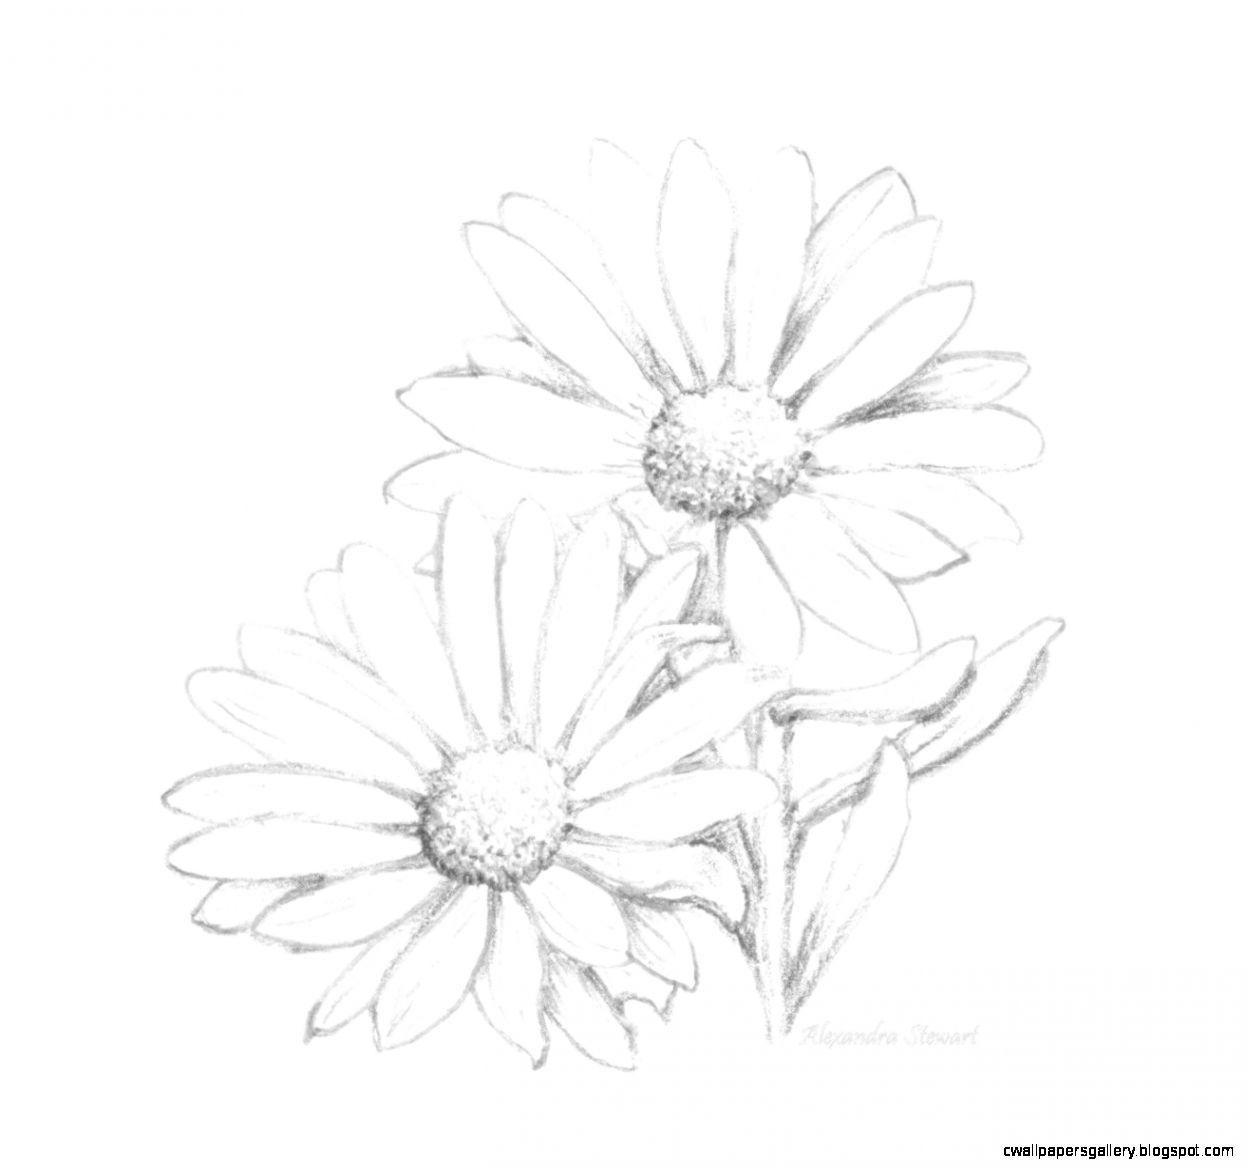 pencil drawings of flowers art  Pencil Sketch Drawing